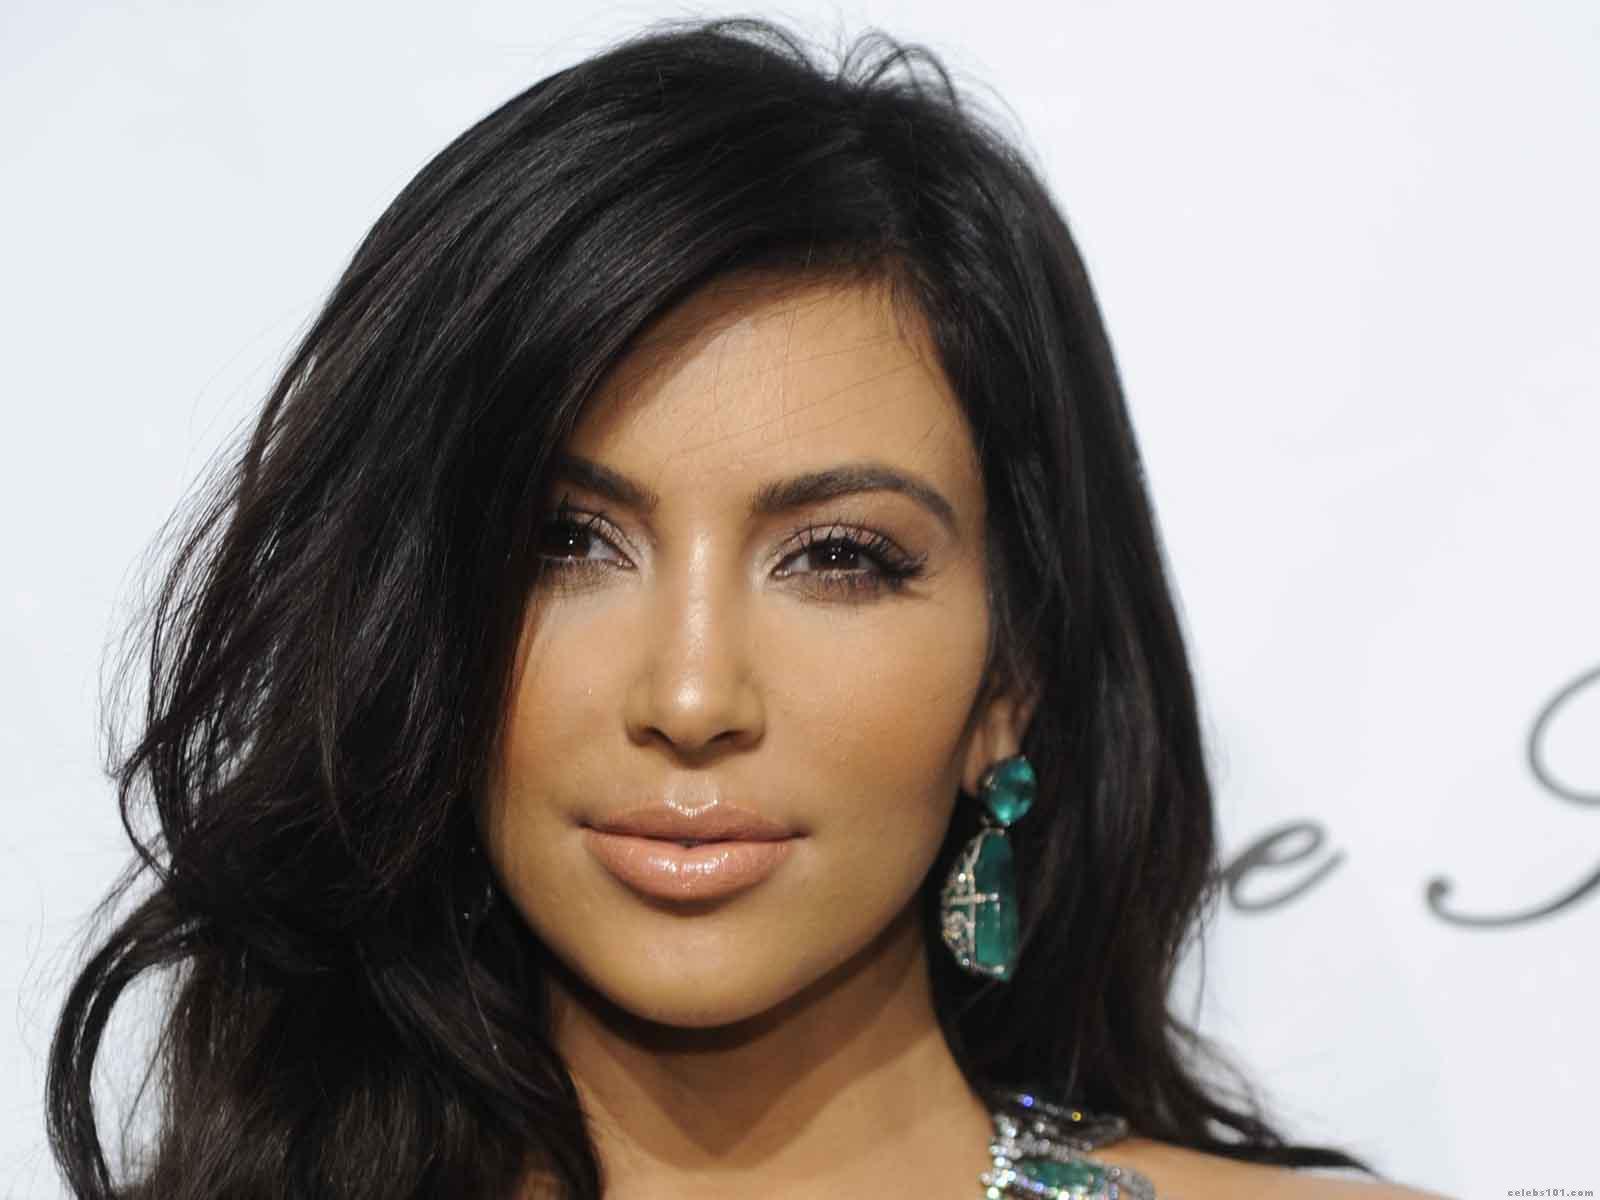 Kim Kardashian Background Sexy Full Screen Wallpaper Celebrity 91014 1600x1200